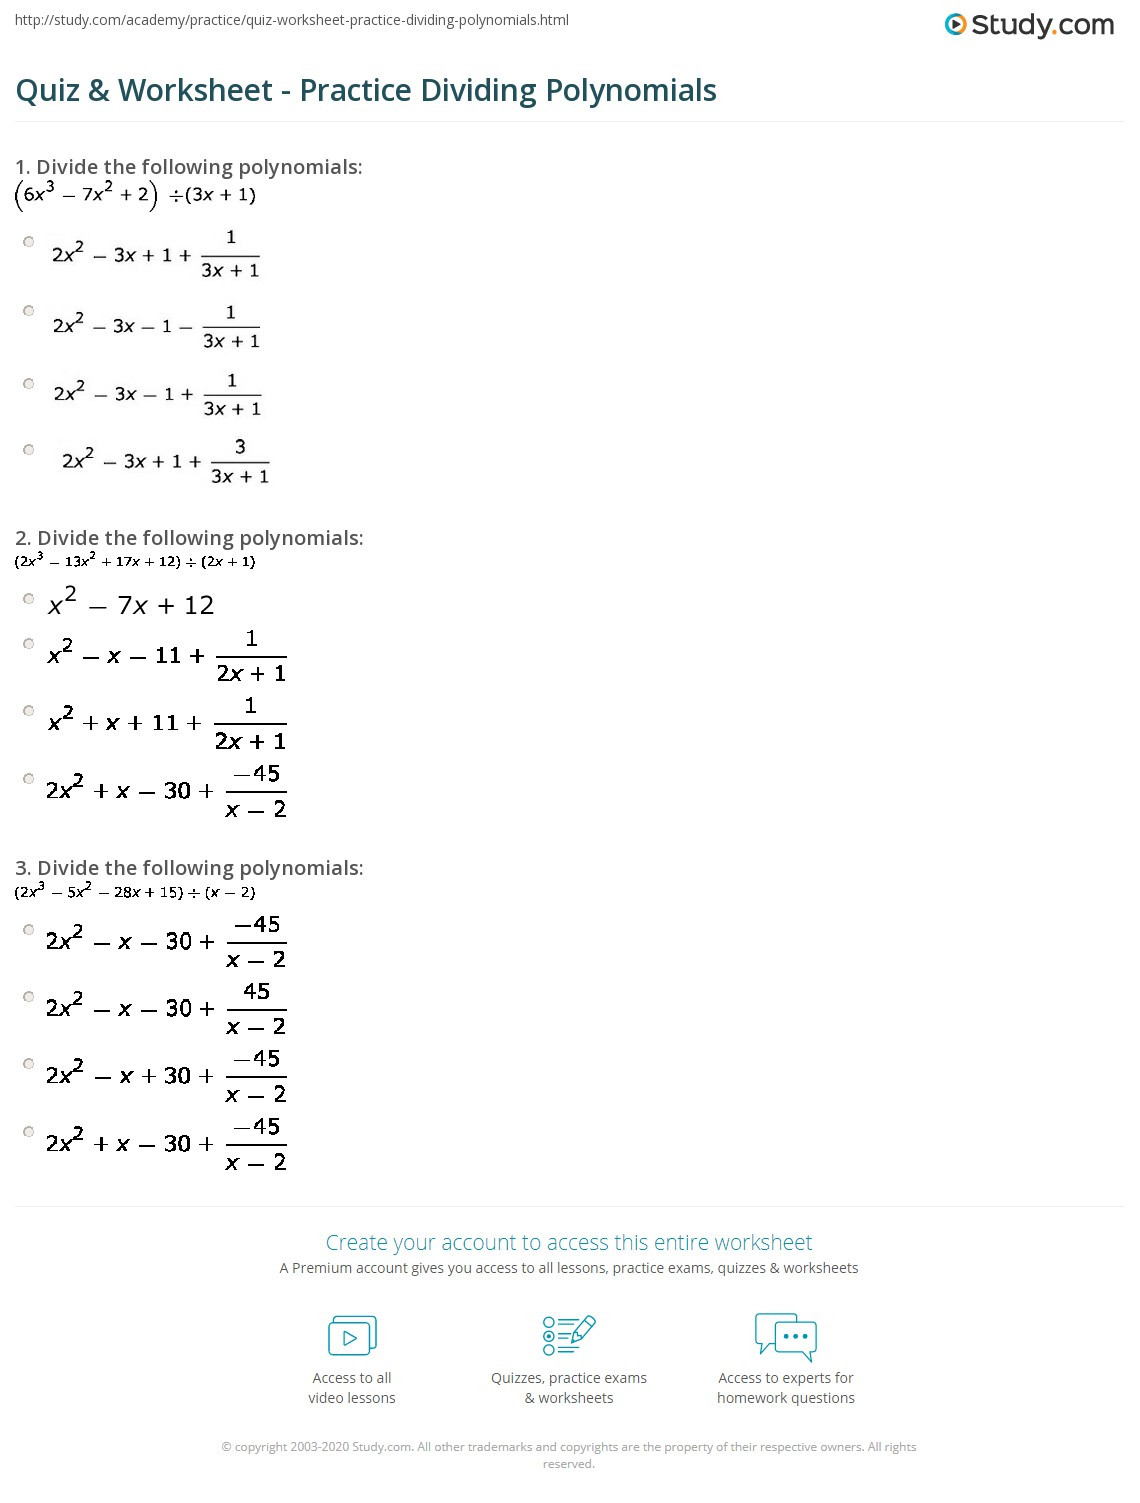 Dividing Polynomials Worksheet Answers Quiz & Worksheet Practice Dividing Polynomials